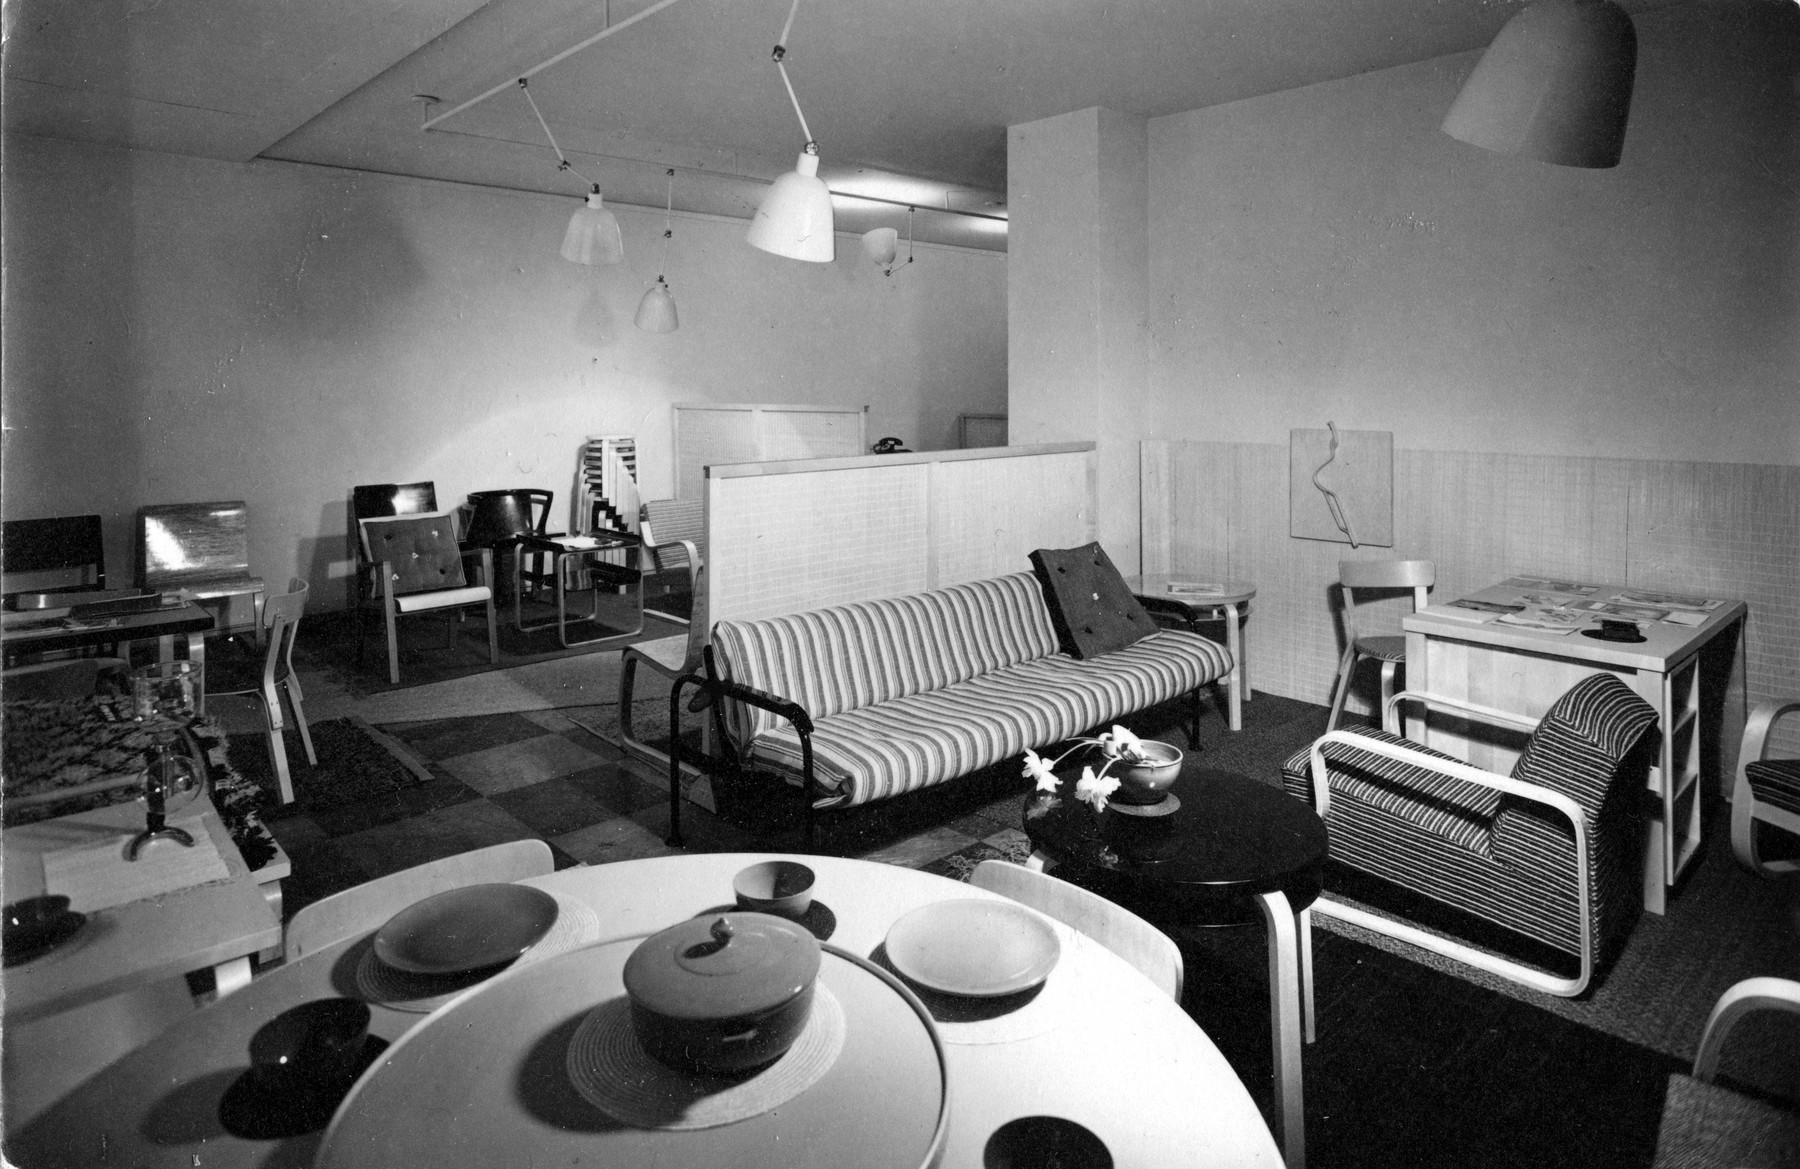 1838125 Fabianinkatu first Artek store in Helsinki 1936 master